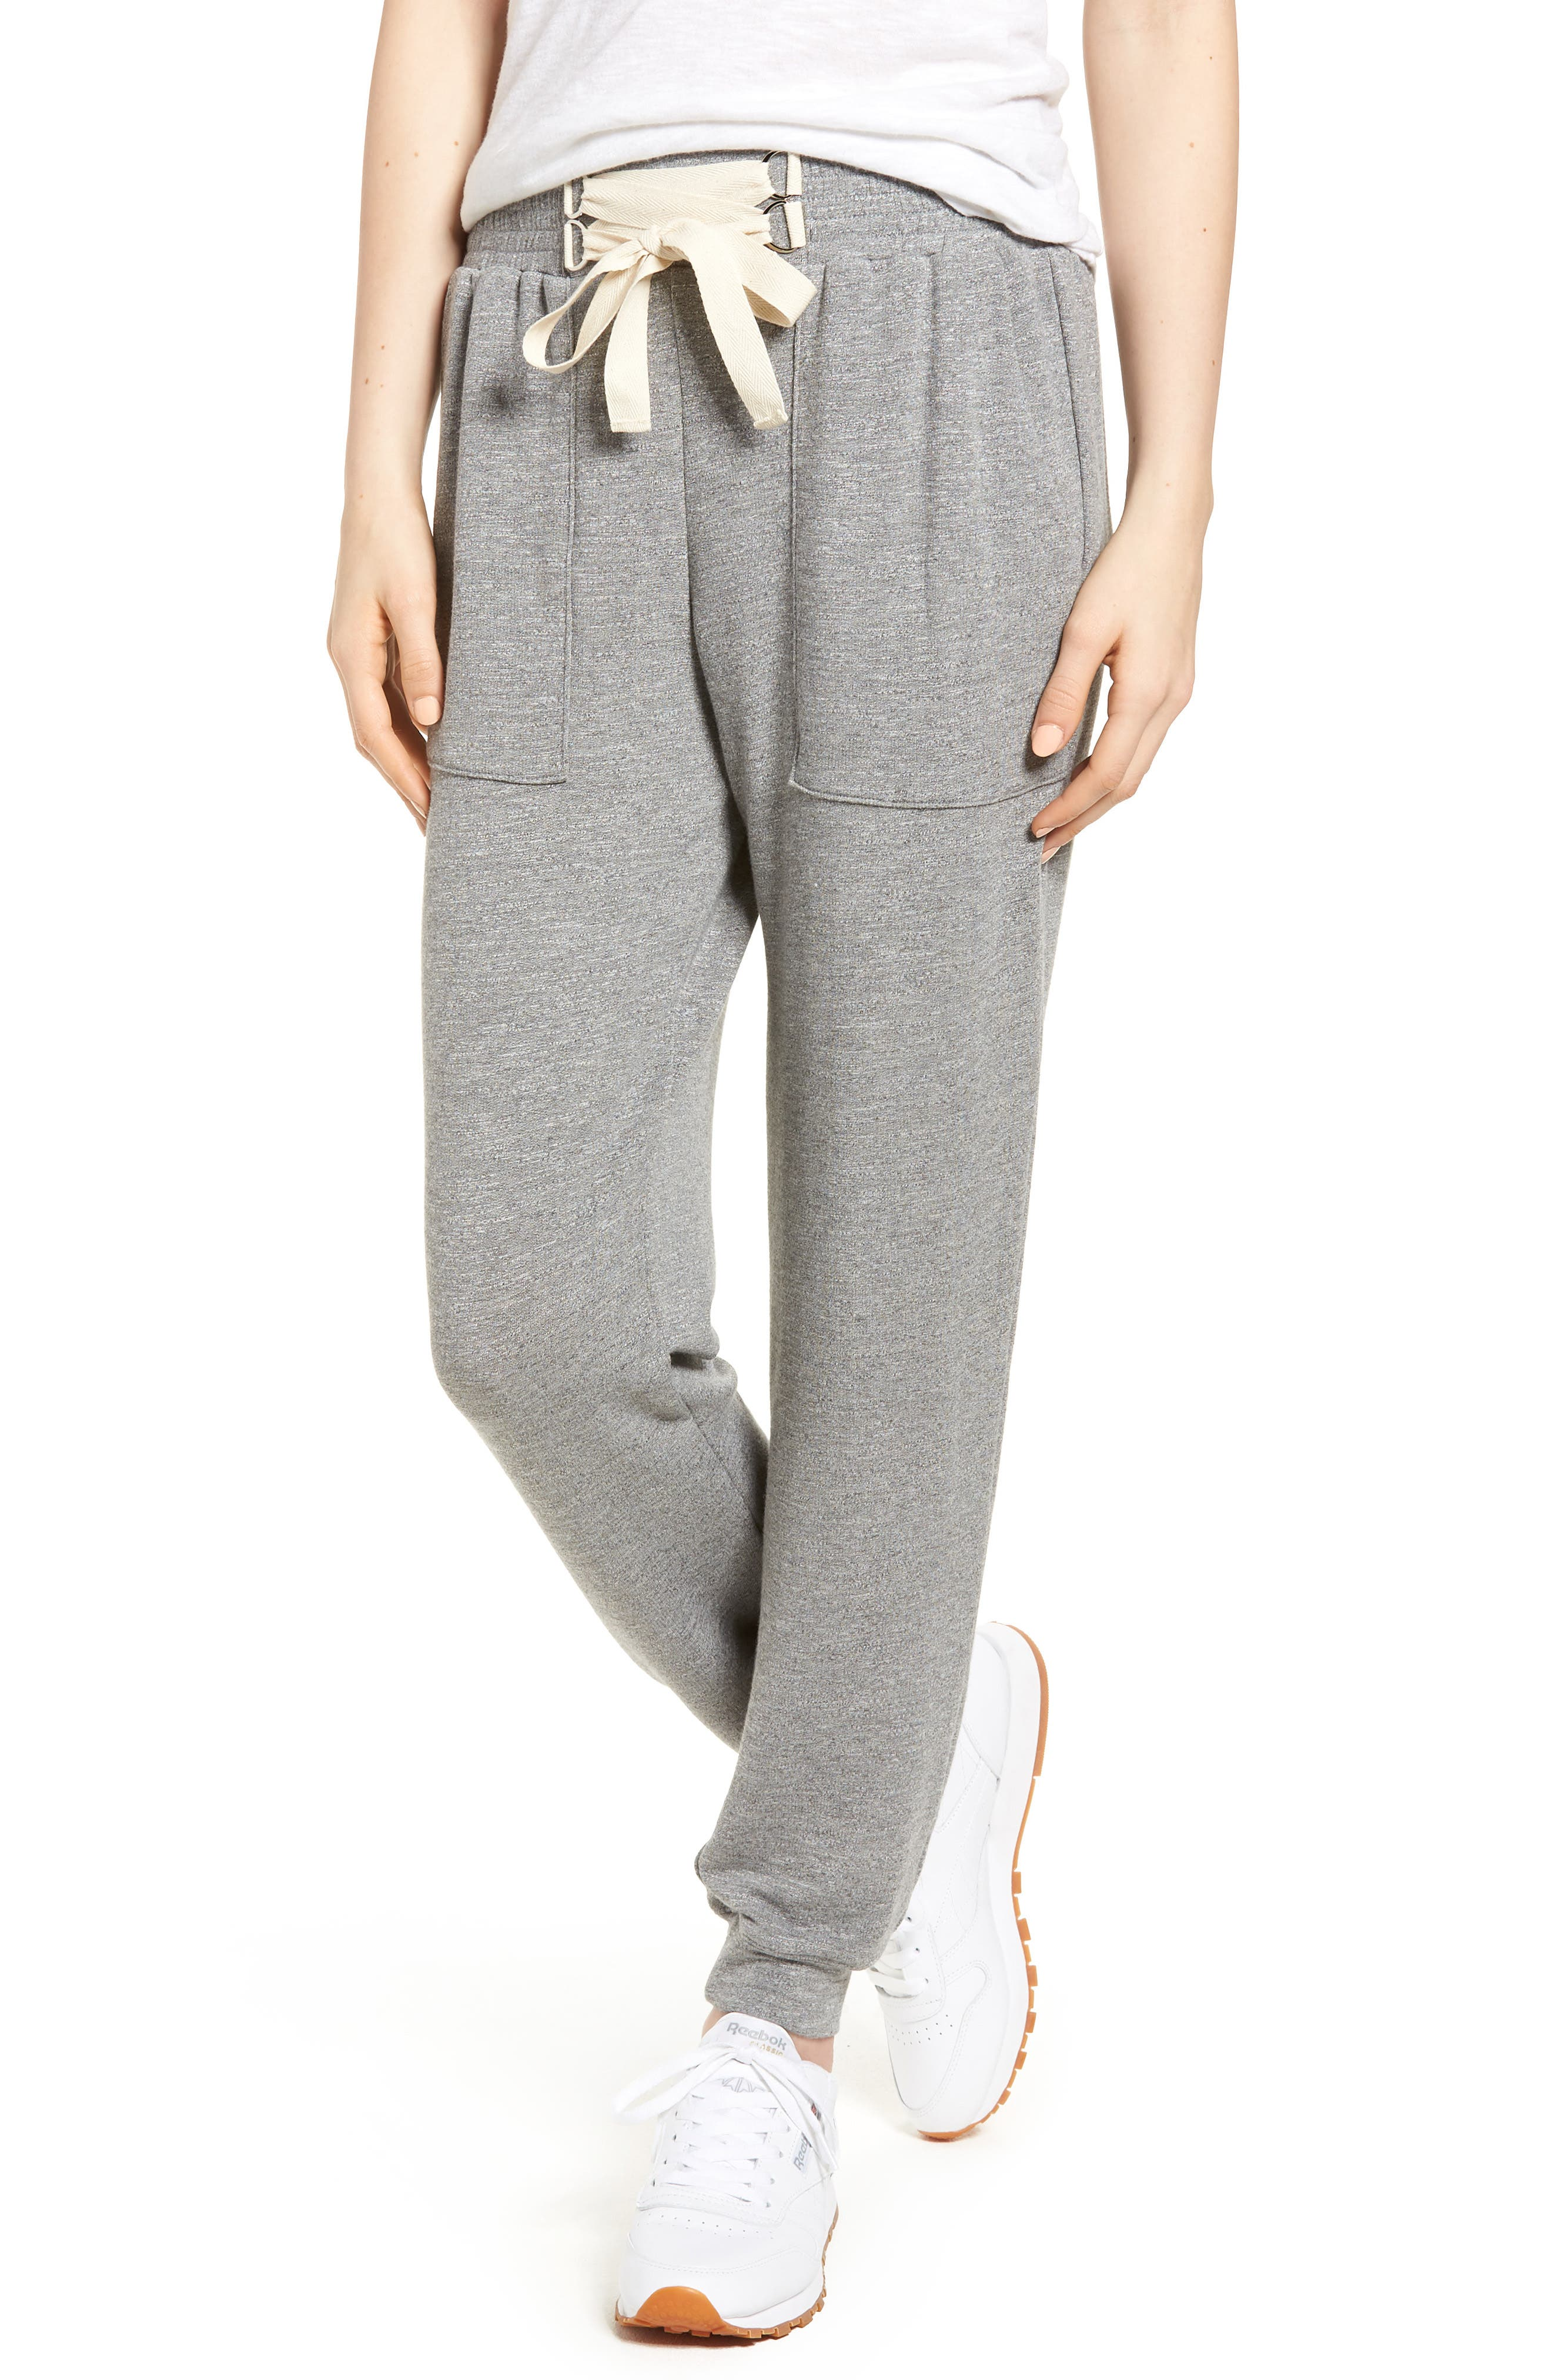 Dream Active Jogger Pants,                         Main,                         color, Heather Grey